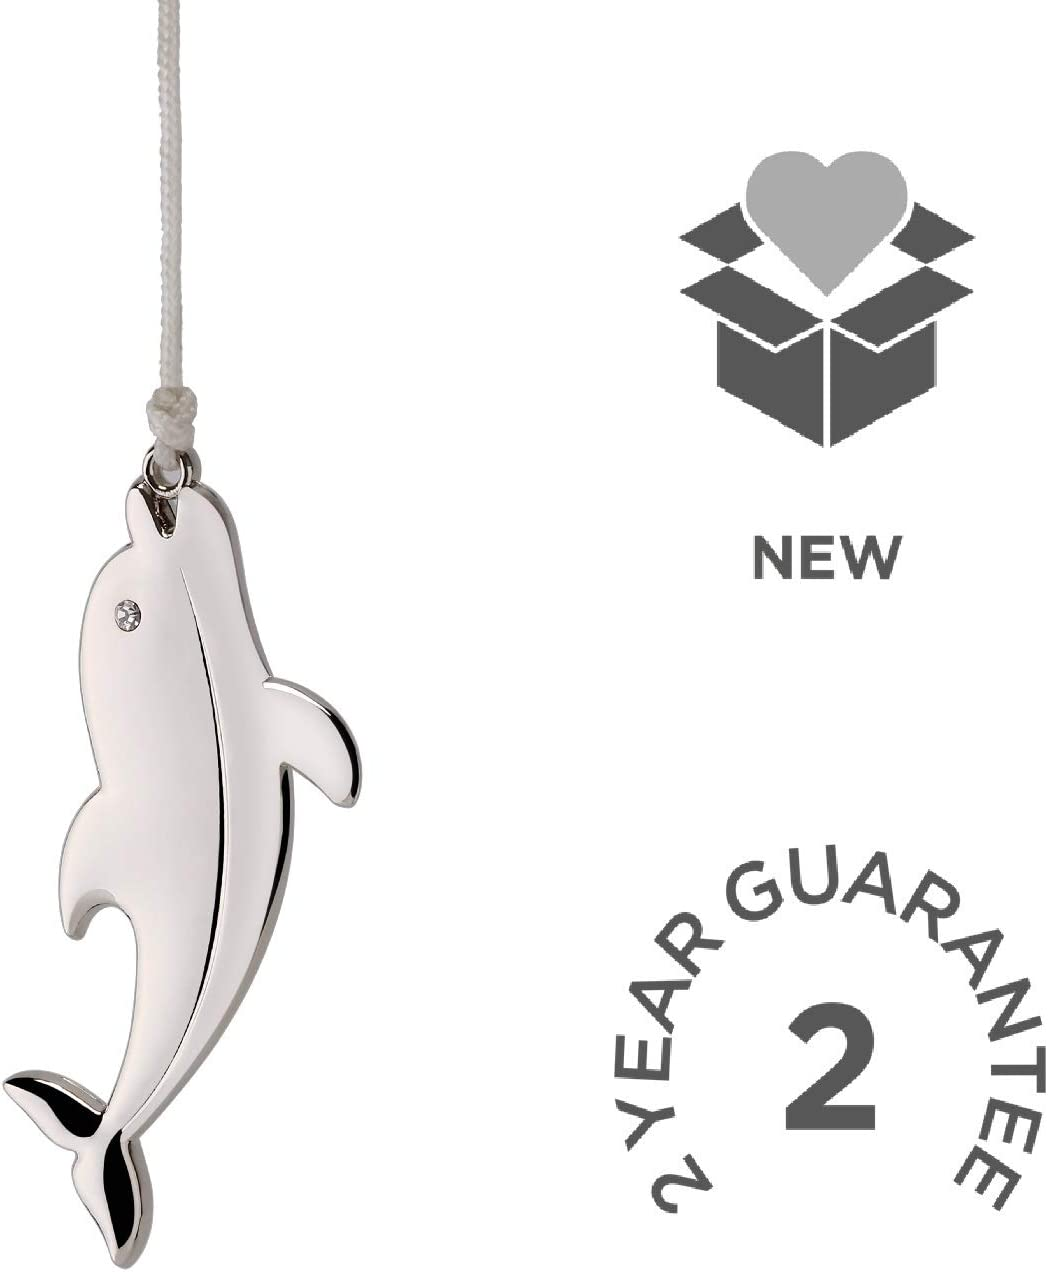 Chrome Modern Bathroom Dolphin Light Pull Handle and Cord Nuie AMA011